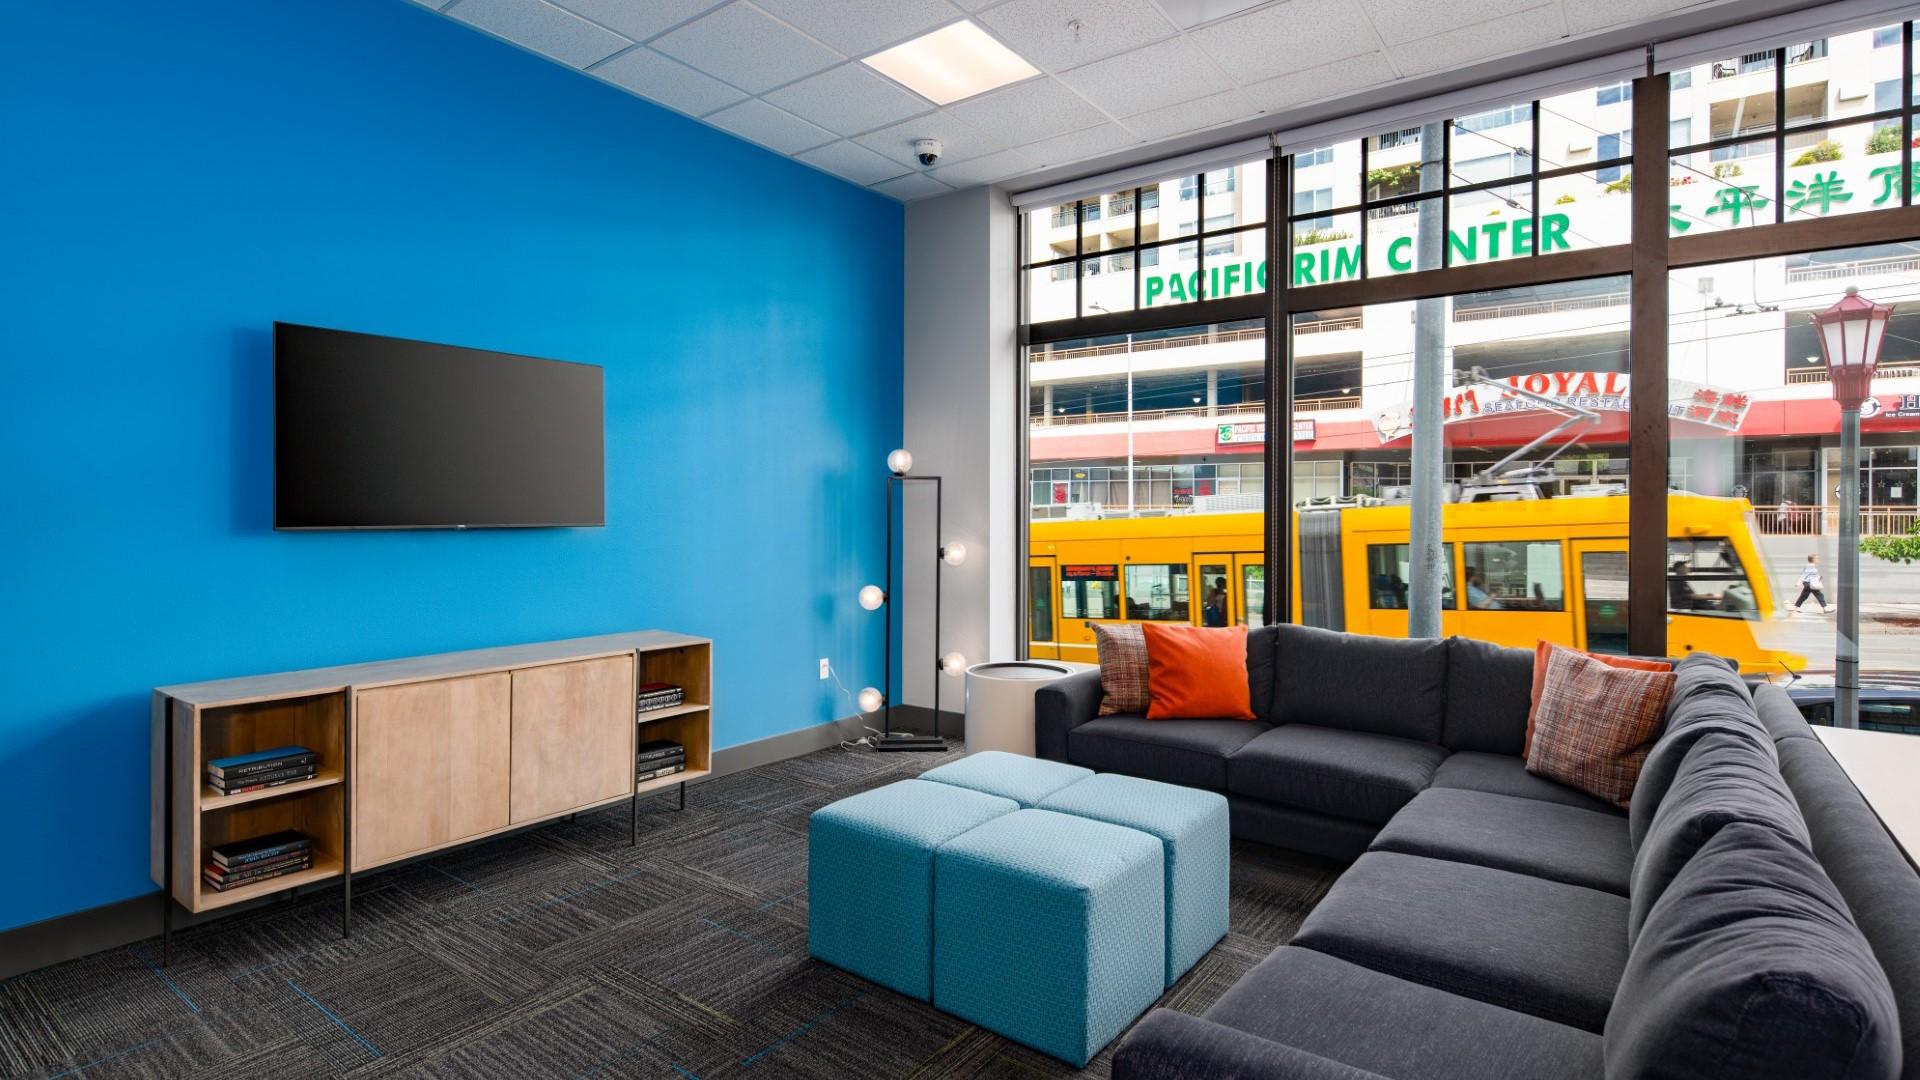 Thai Binh Apartments Seattle Washington Architecture Photography